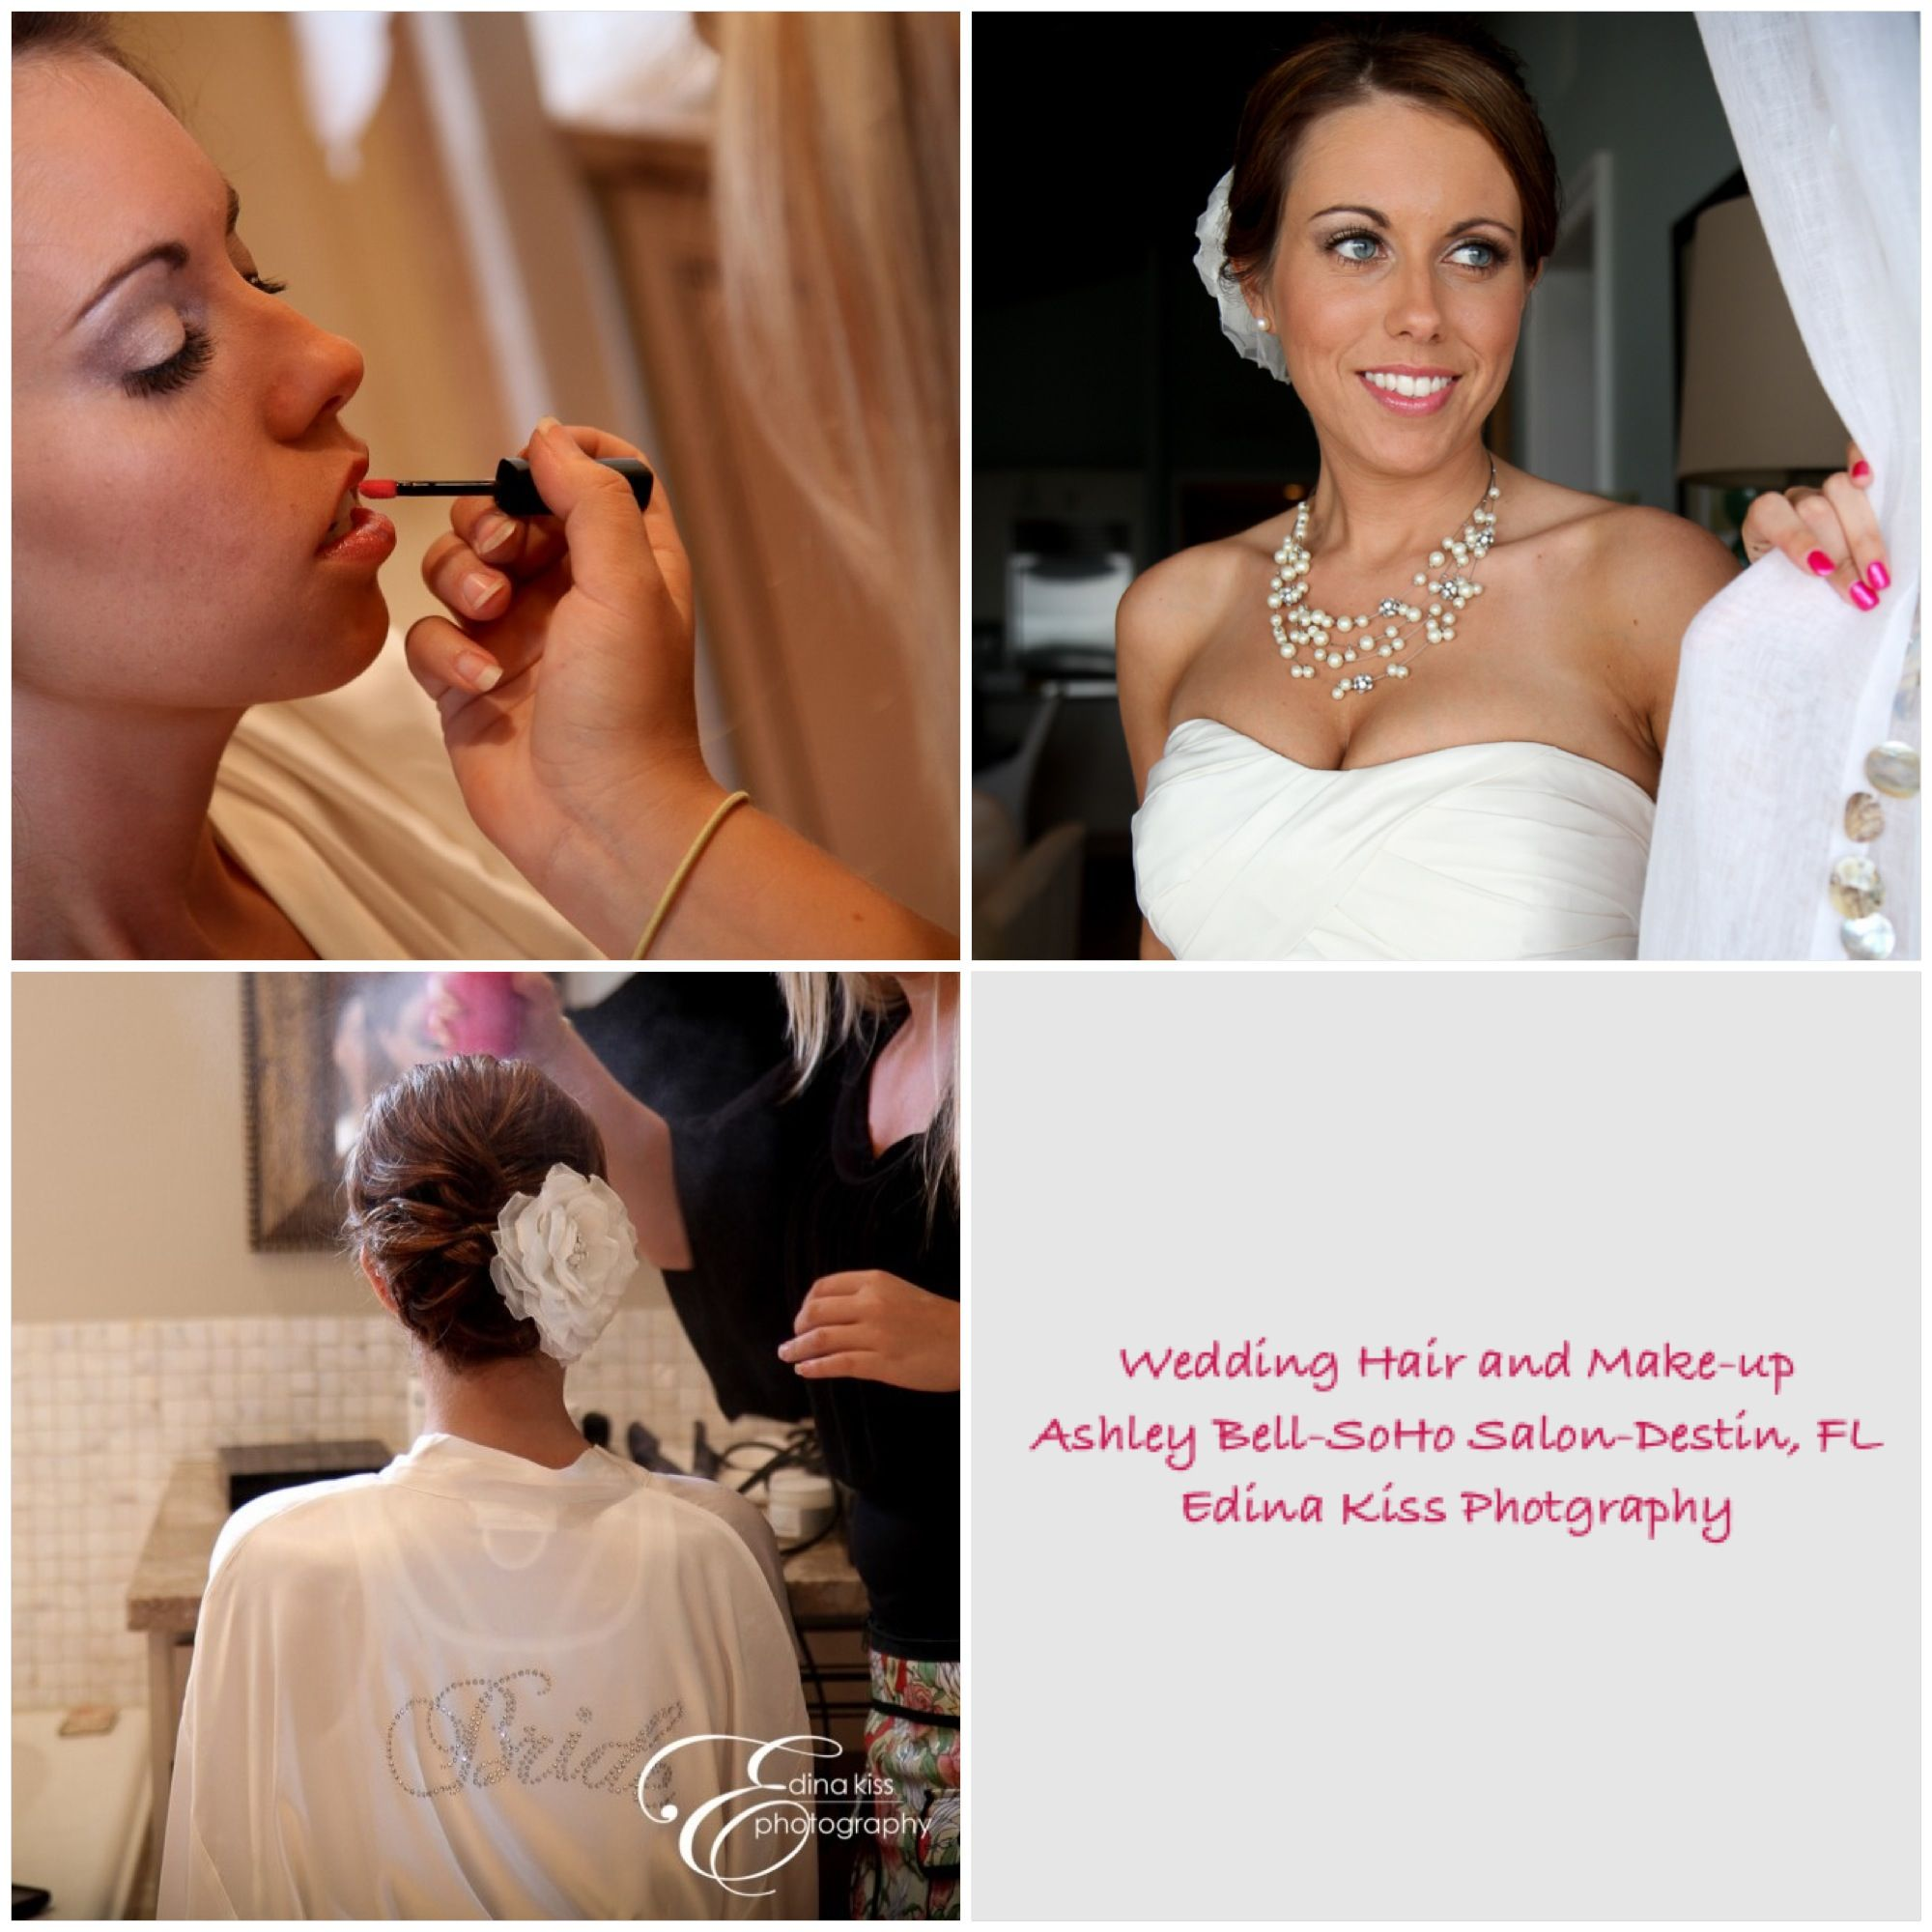 wedding hair and make-up by ashley bell, soho salon, destin, fl